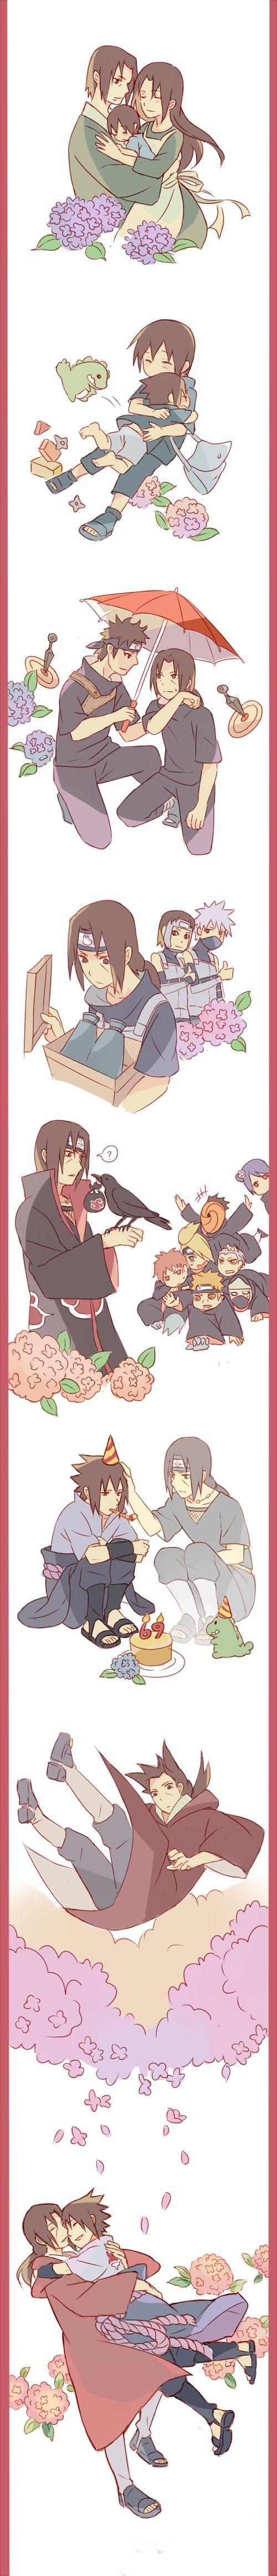 Itachi and Sasuke!: